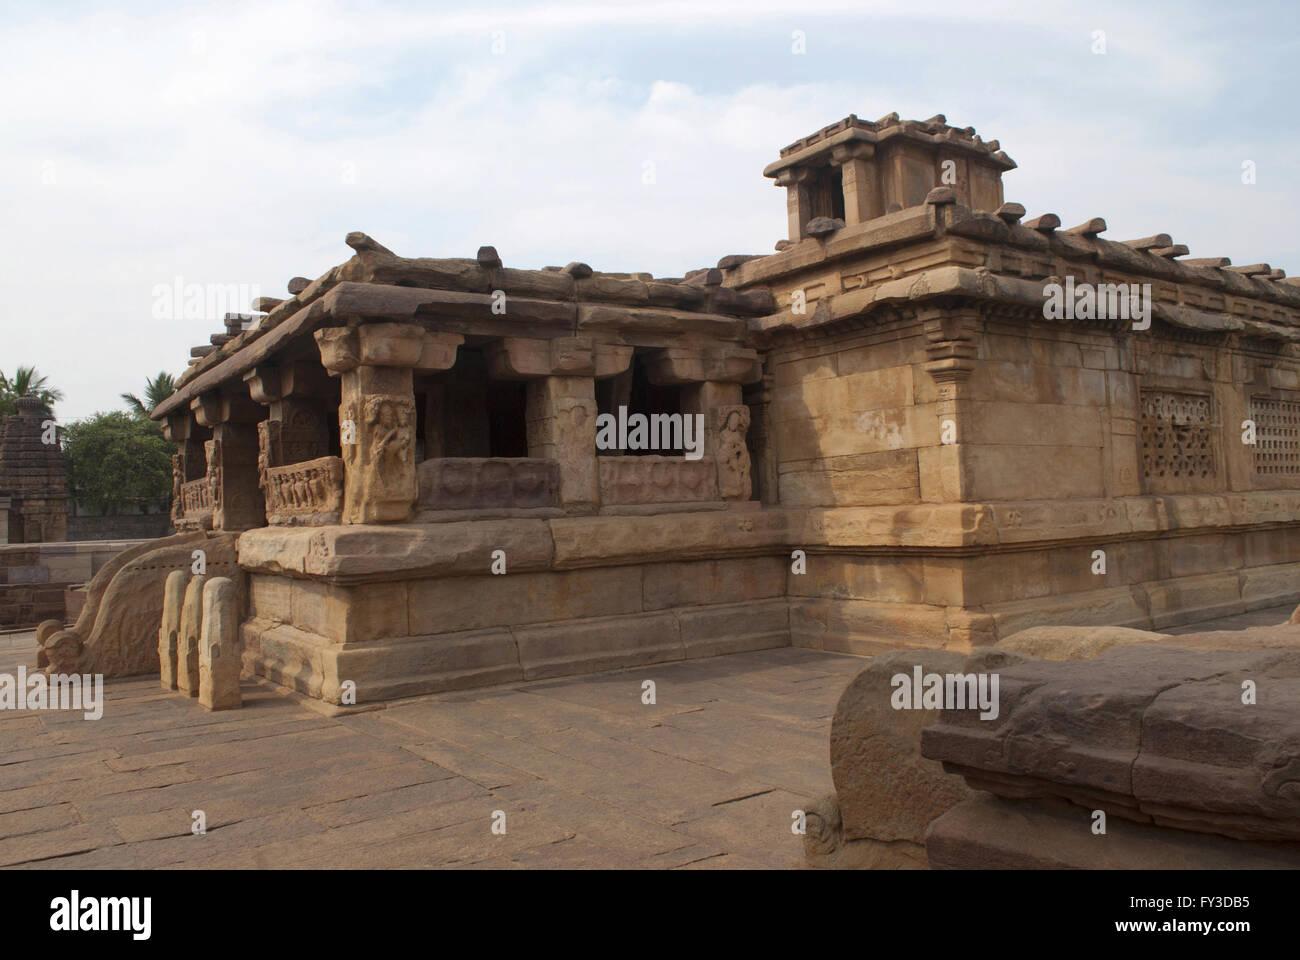 Lad Khan temple, Aihole, Bagalkot, Karnataka, India. Kontigudi group of temples. This is the oldest temple of Aihole. - Stock Image